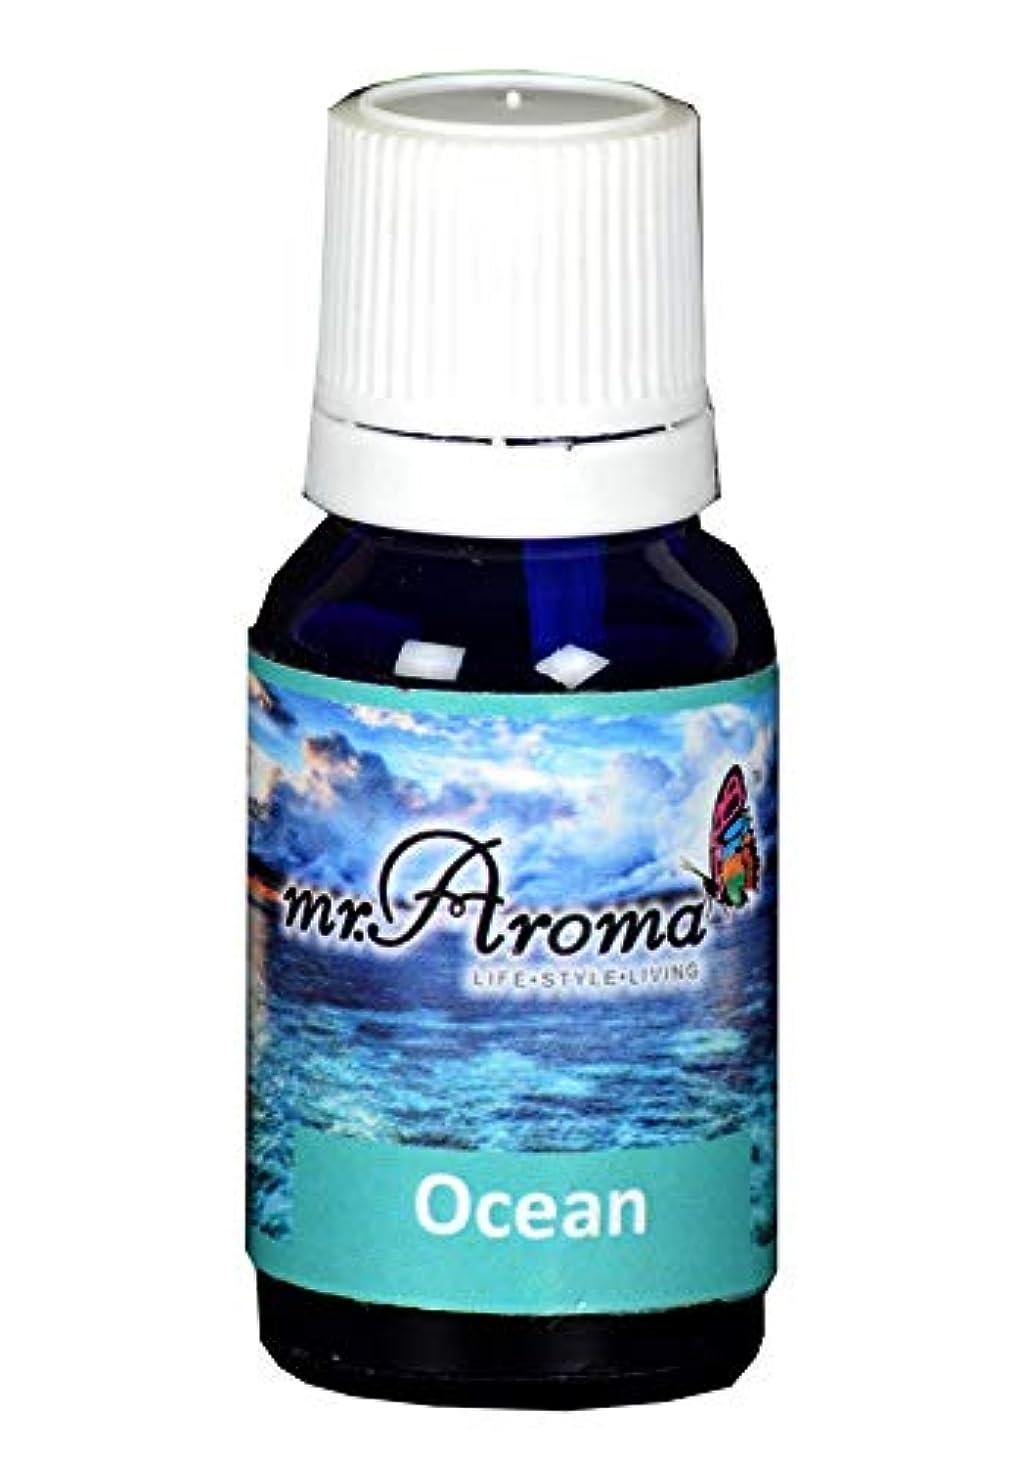 Mr. Aroma Ocean Vaporizer/Essential Oil 15ml